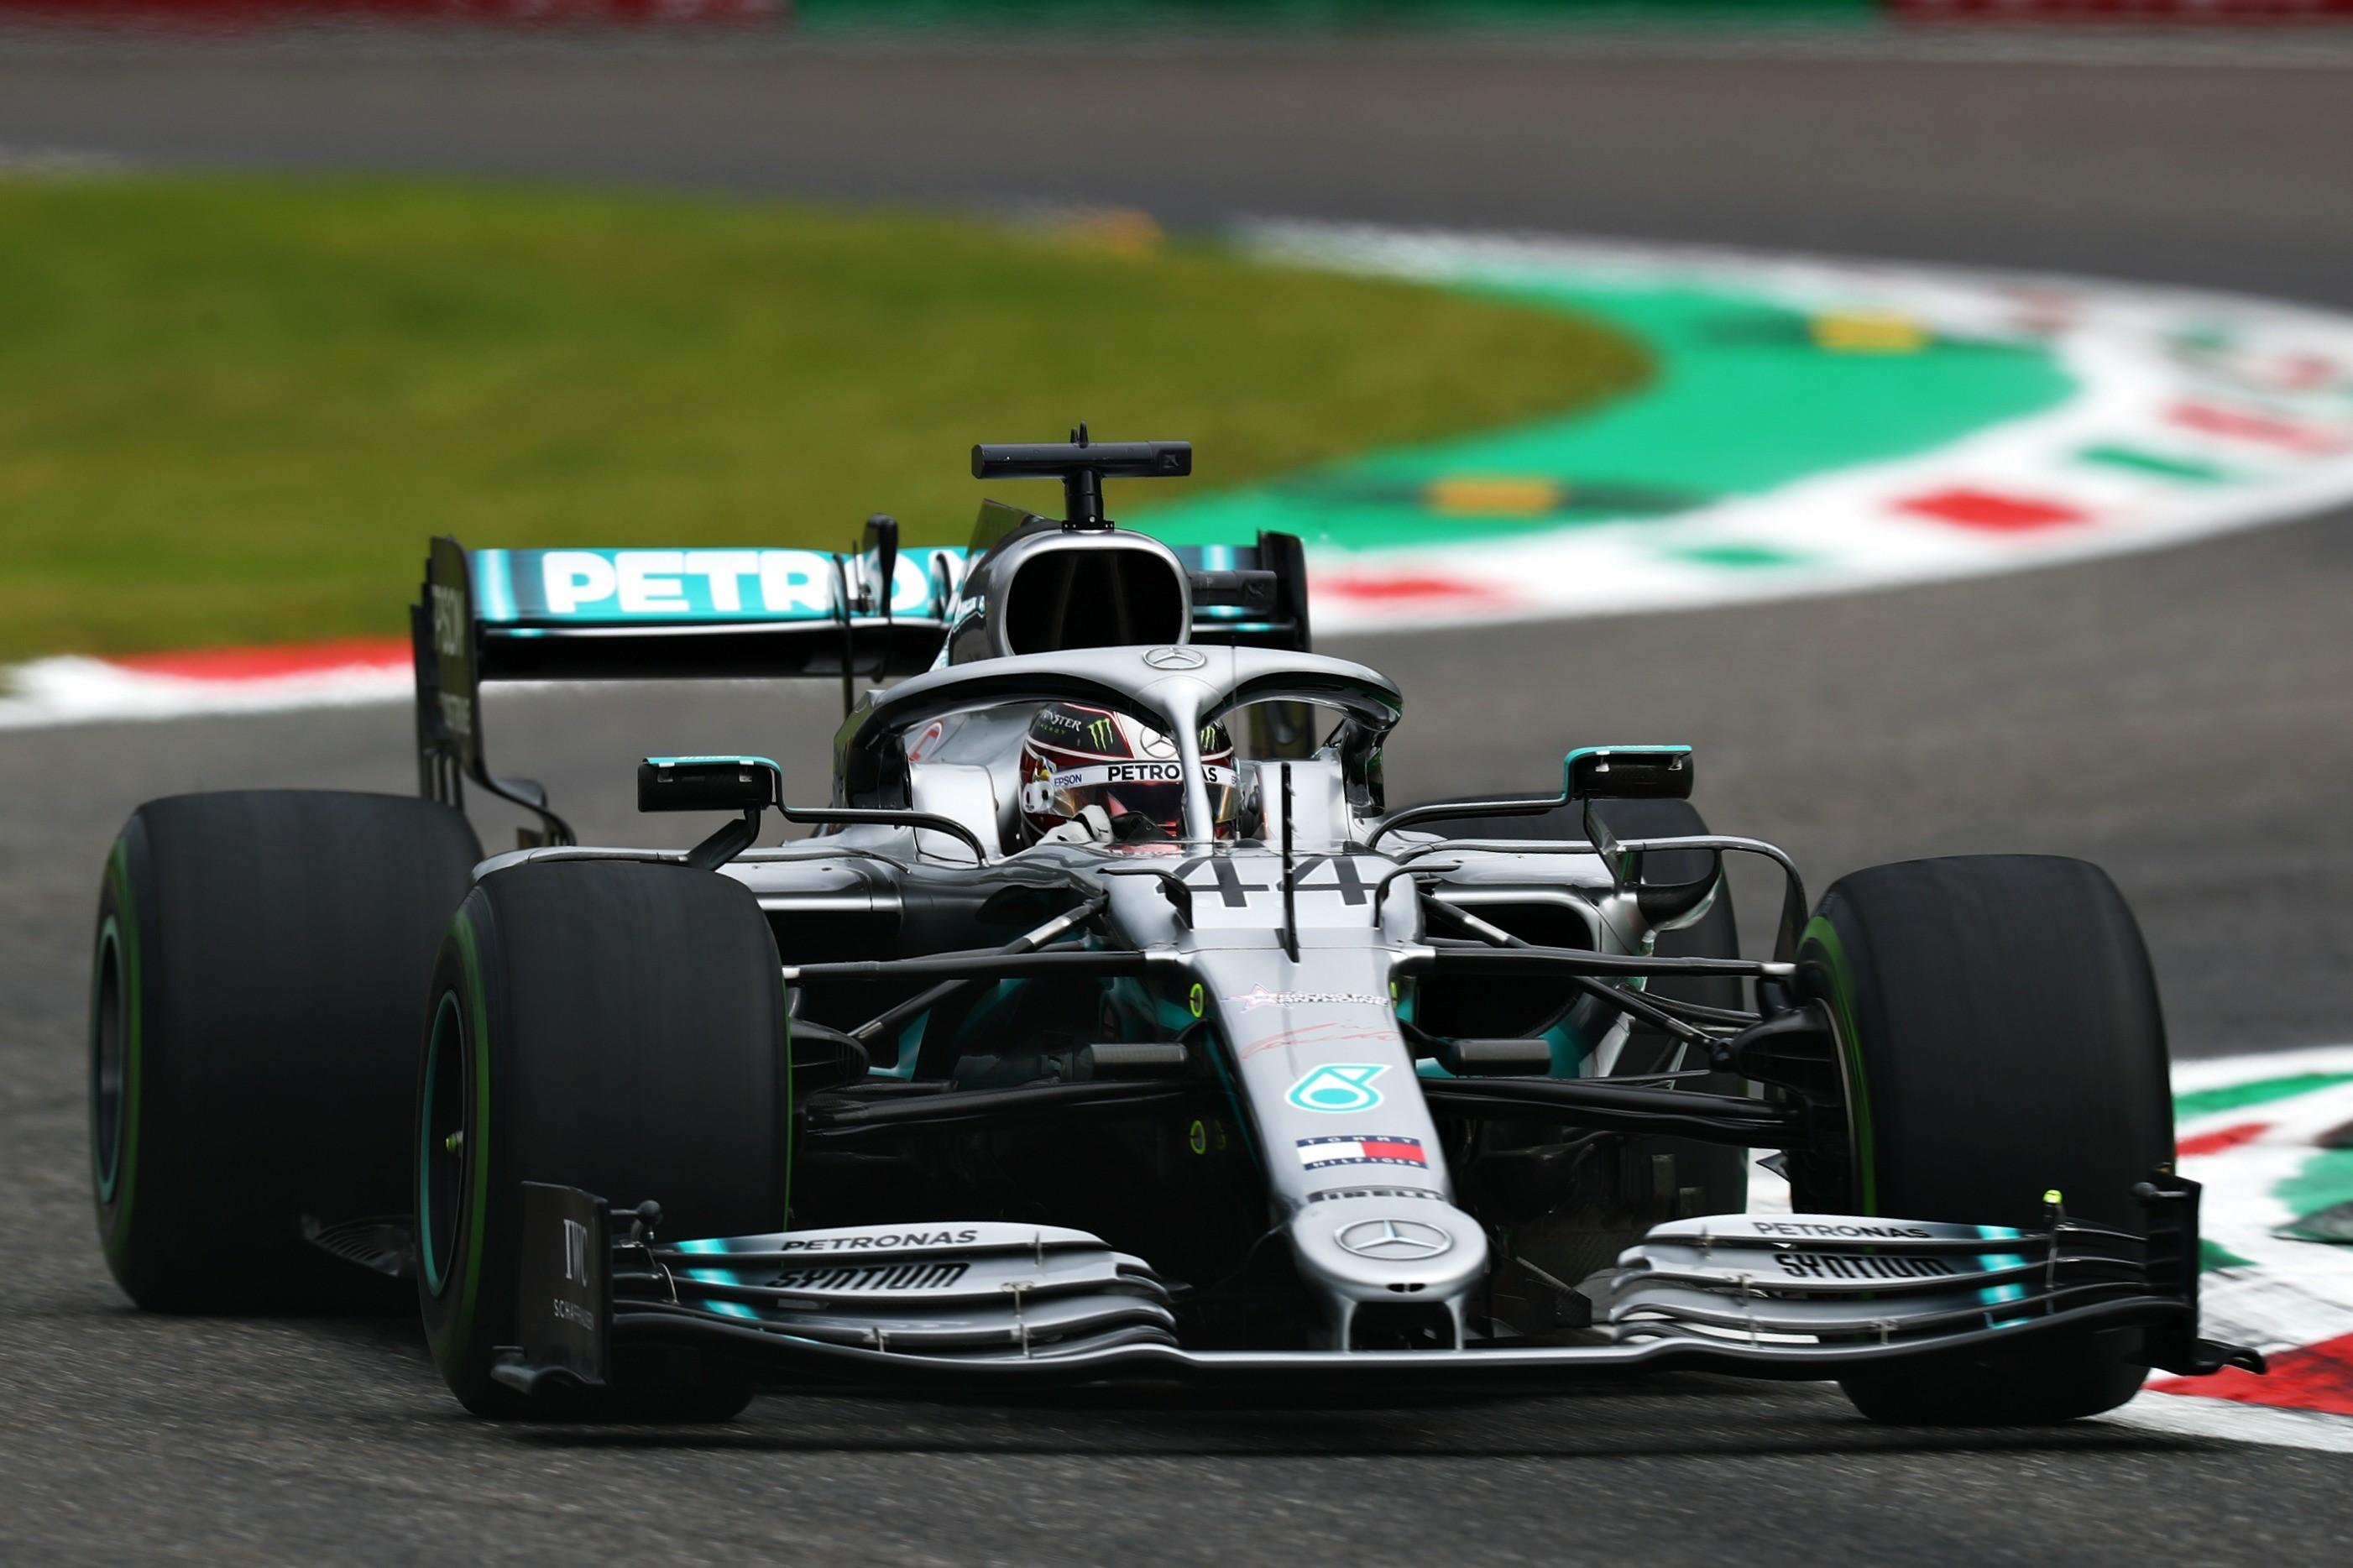 Lewis Hamilton (Mercedes) au Grand Prix d'Italie 2019